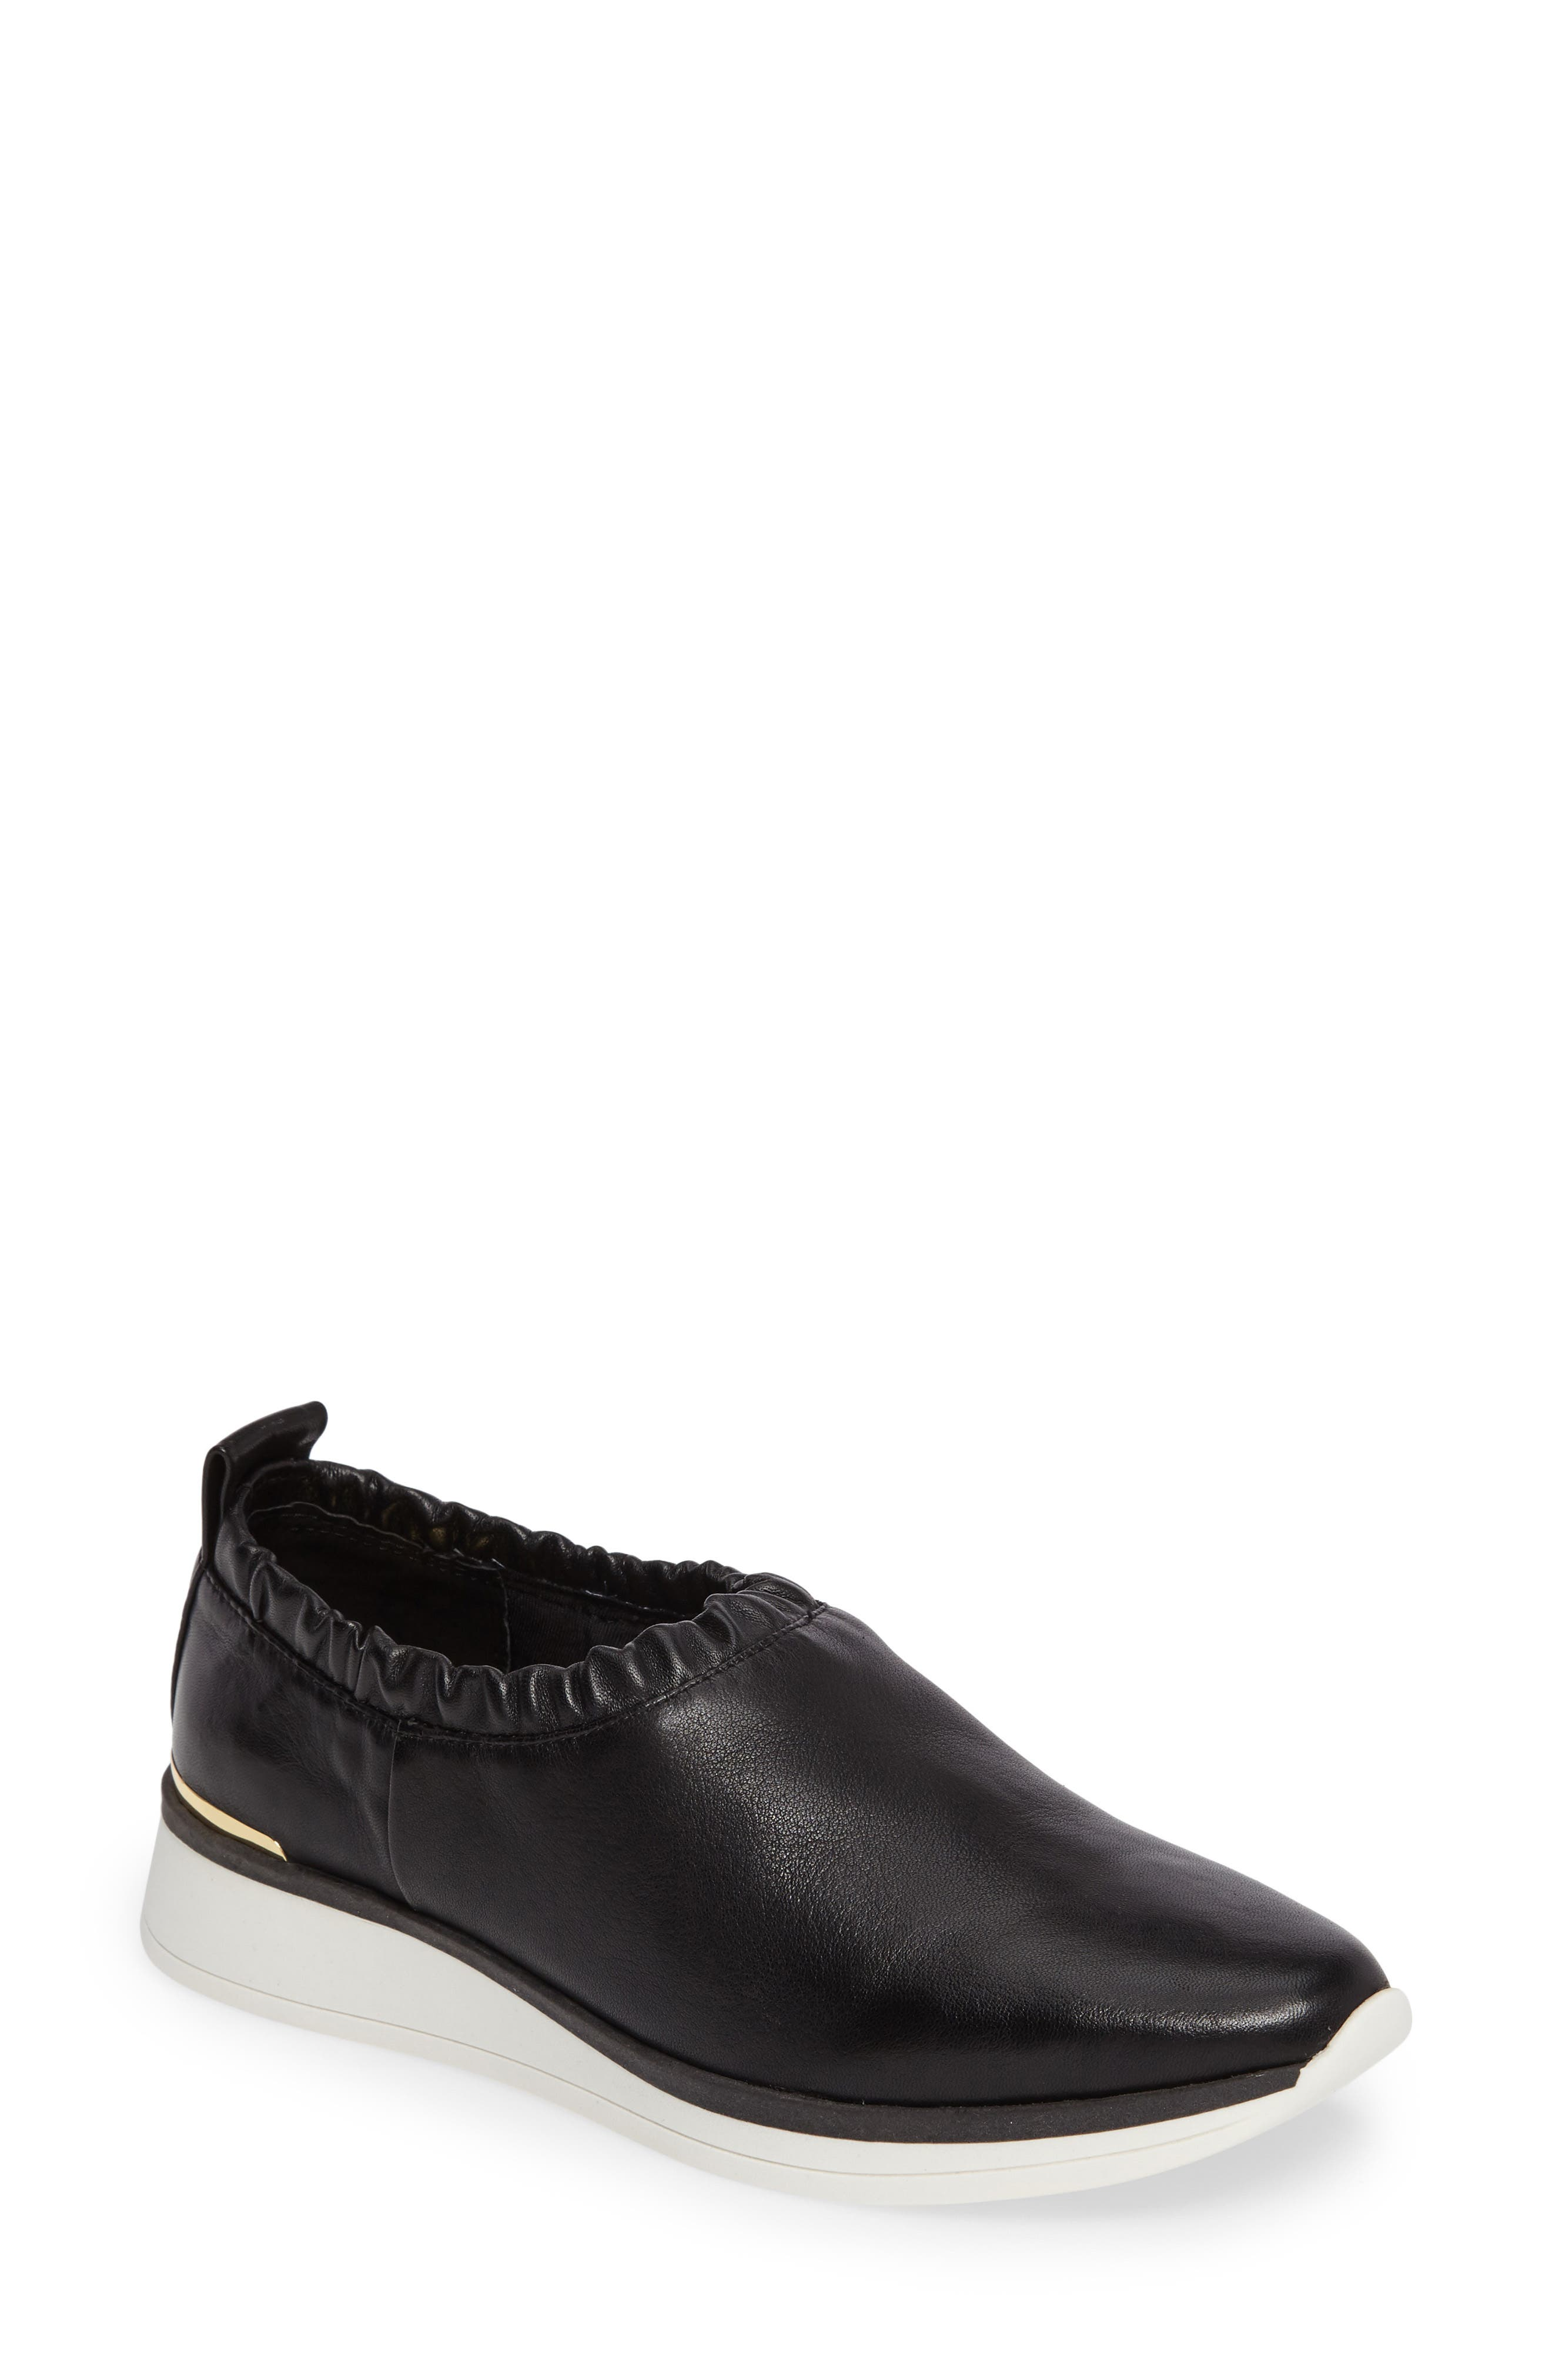 Brogen Slip-On Sneaker,                         Main,                         color, Black Leather